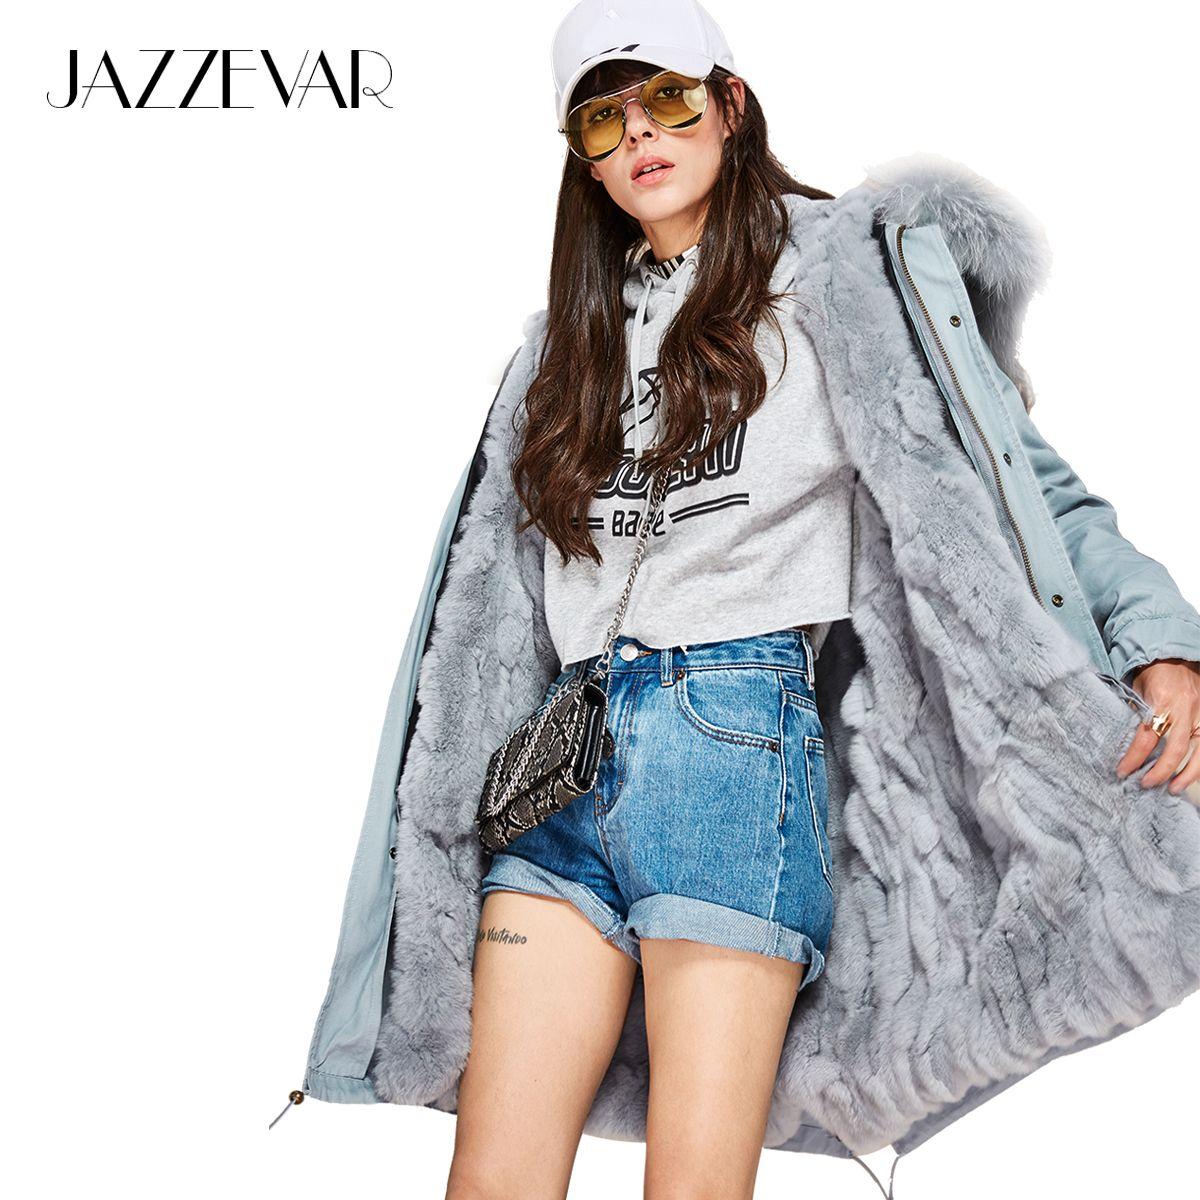 JAZZEVAR New Fashion women's Large raccoon fur collar parka Midi hooded Military coat outwear rabbit fur lining winter jacket